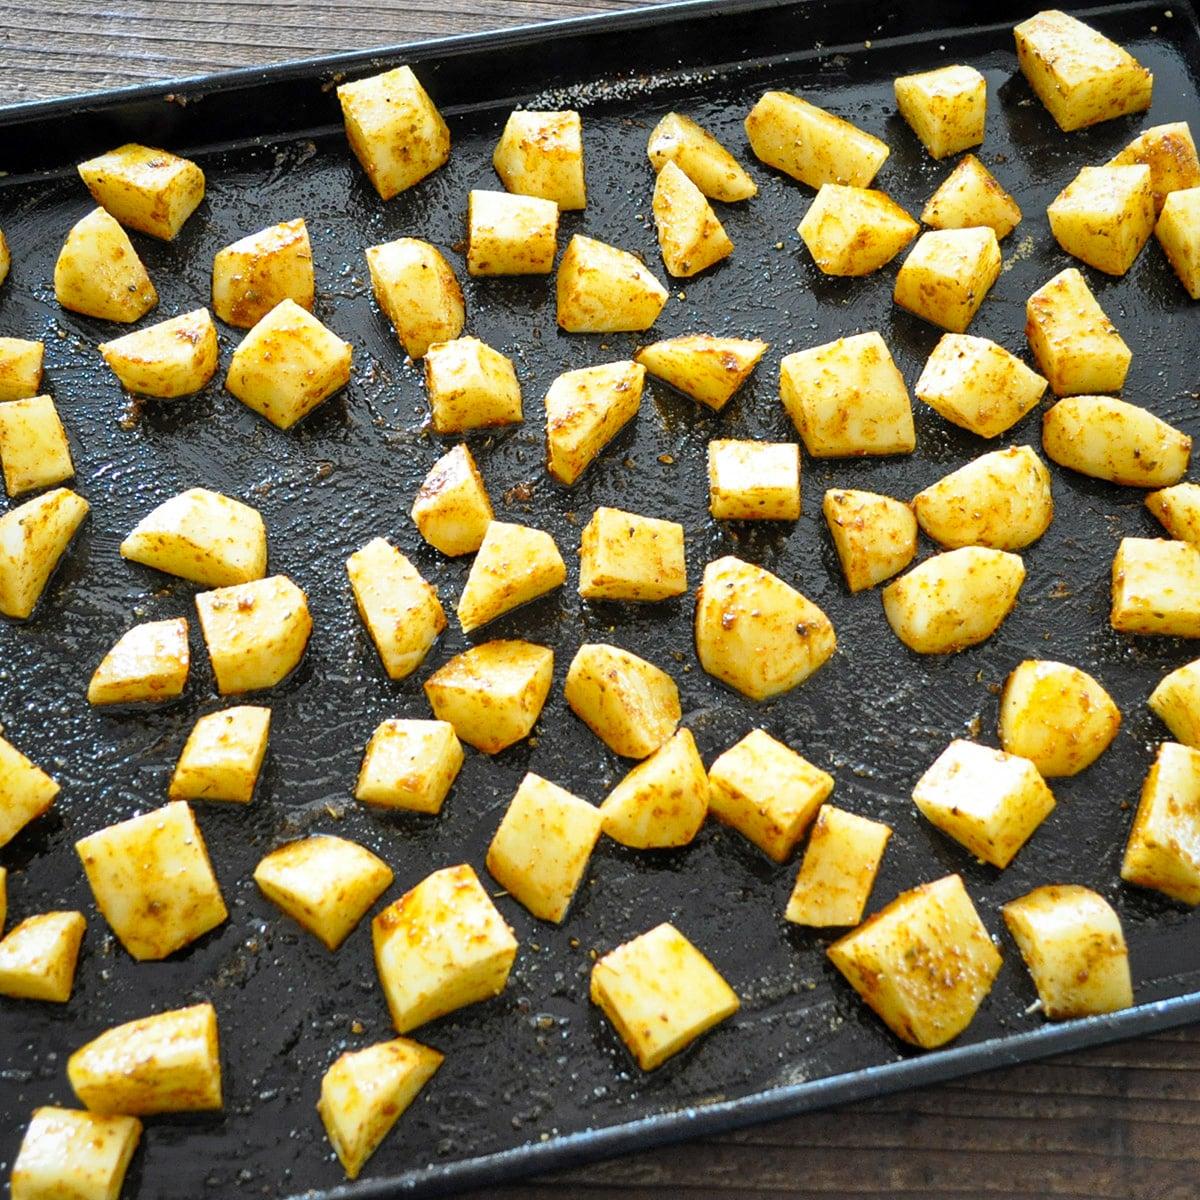 seasoned potatoes ready to bake on a black cookie sheet